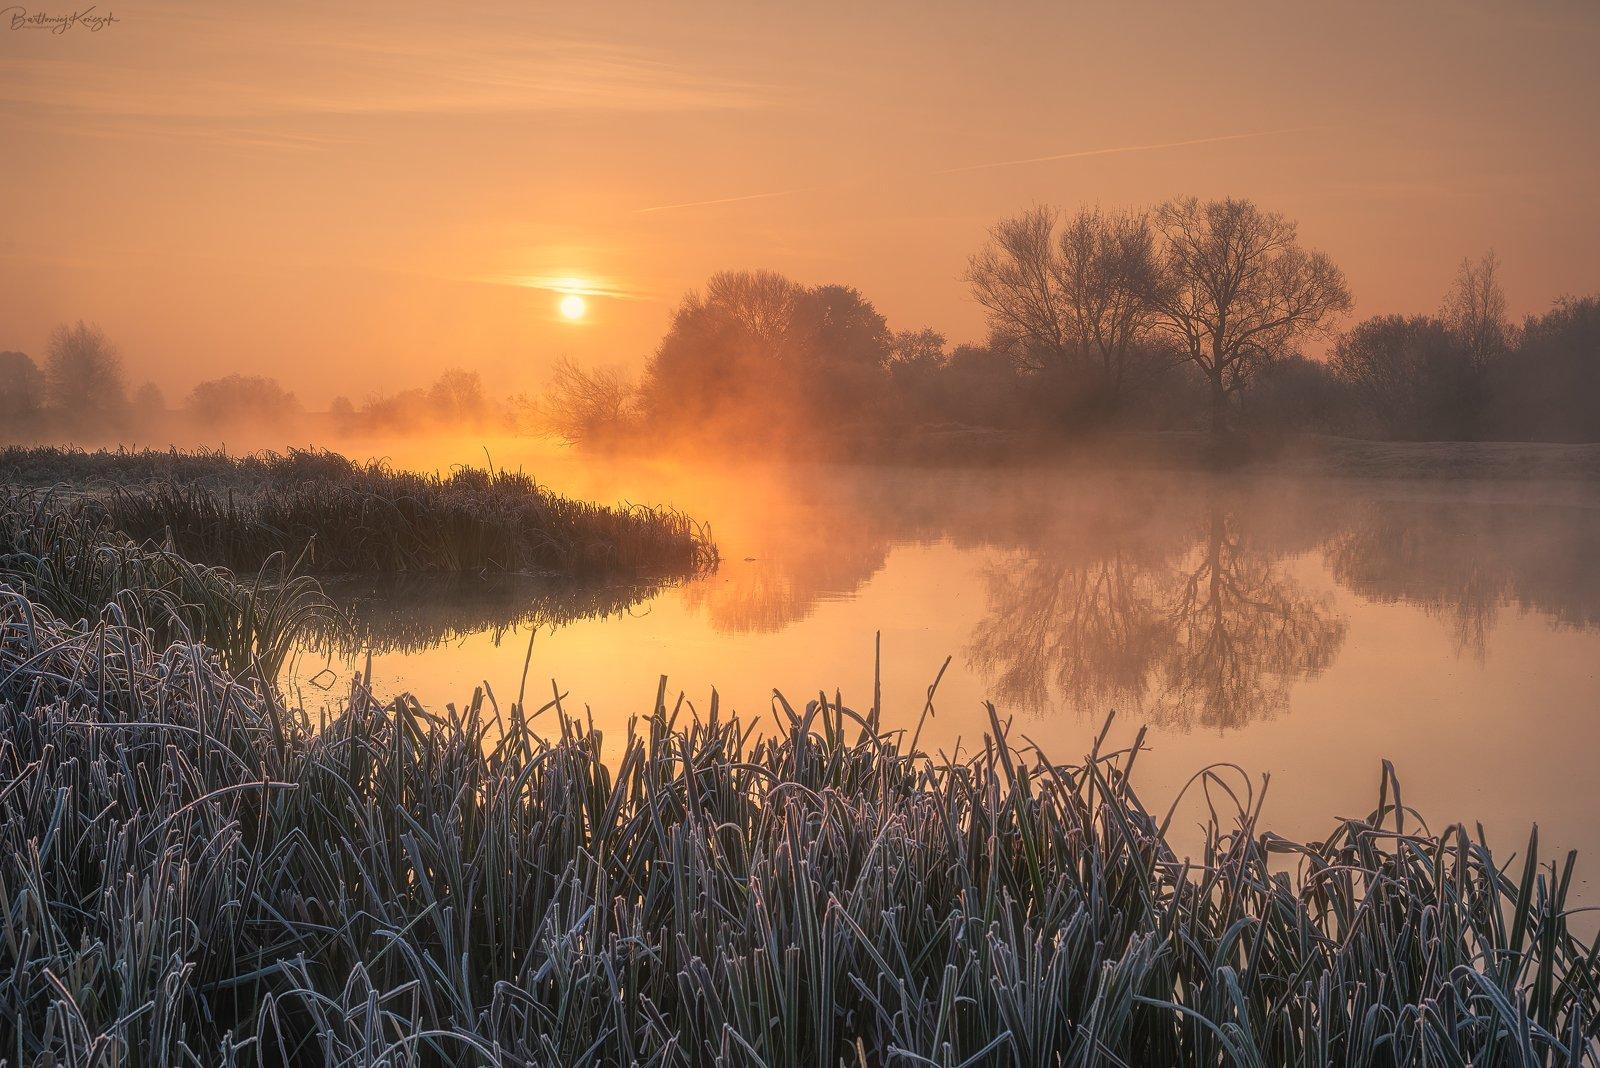 warta, morning, autumn, fog, trees, river, nature, Bartłomiej Kończak